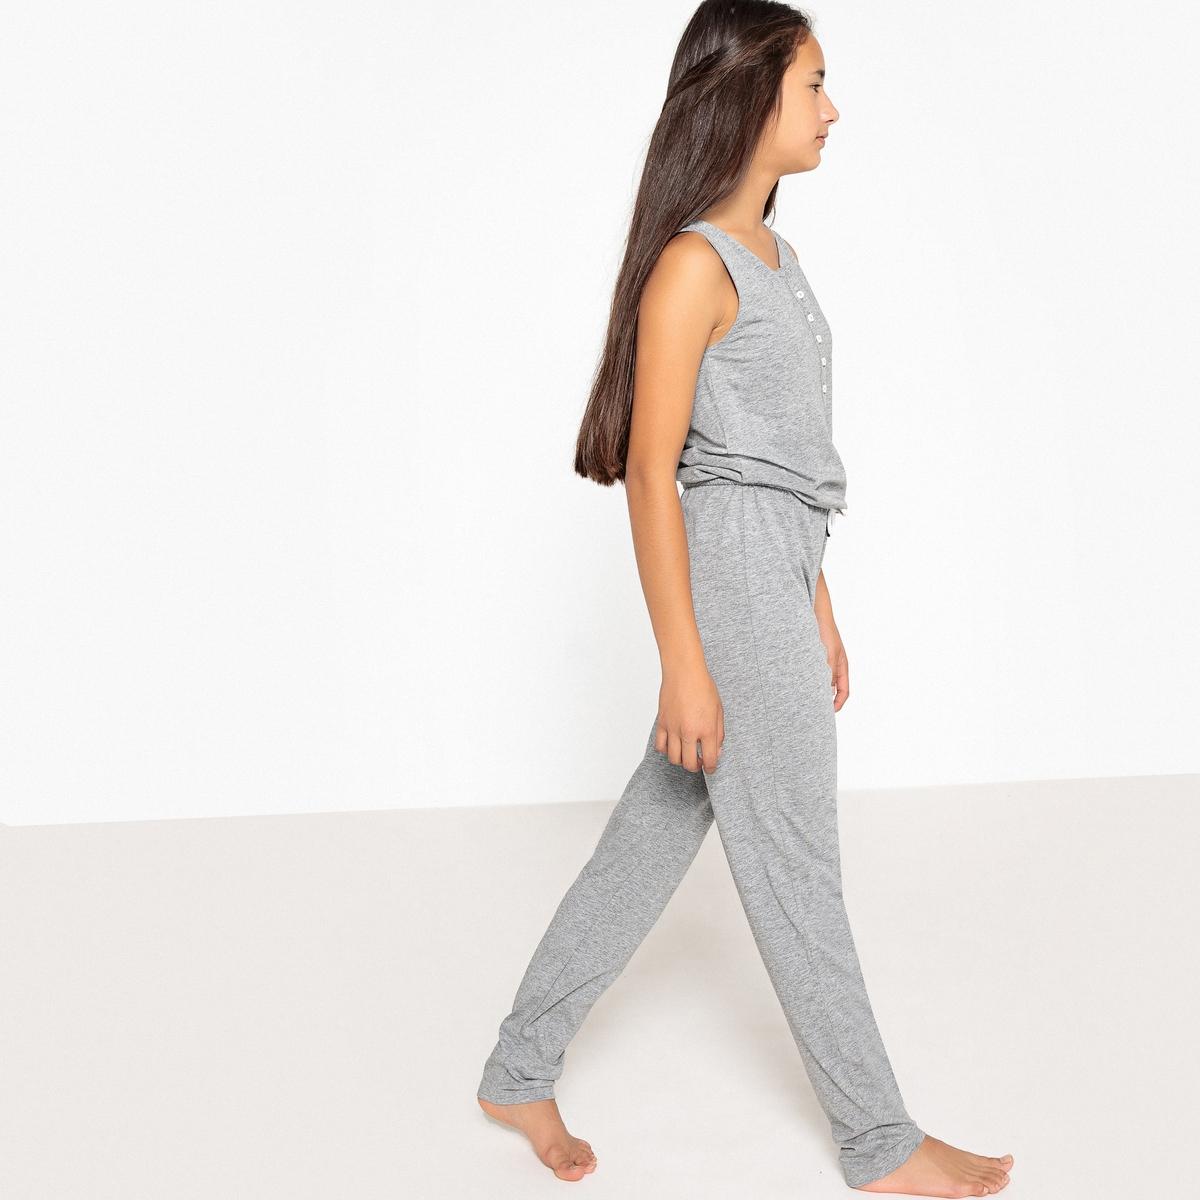 Комбинезон-пижама с рисунком, 10-16 лет комбинезон пижама с рисунком 10 16 лет